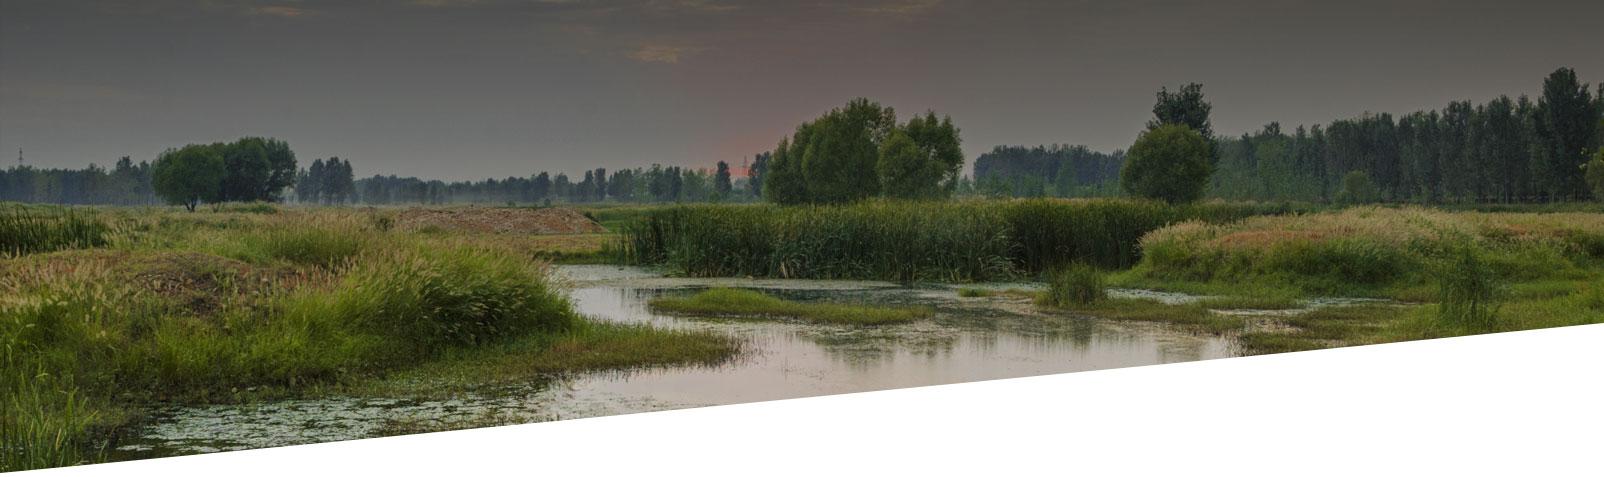 environmental wetland landscape